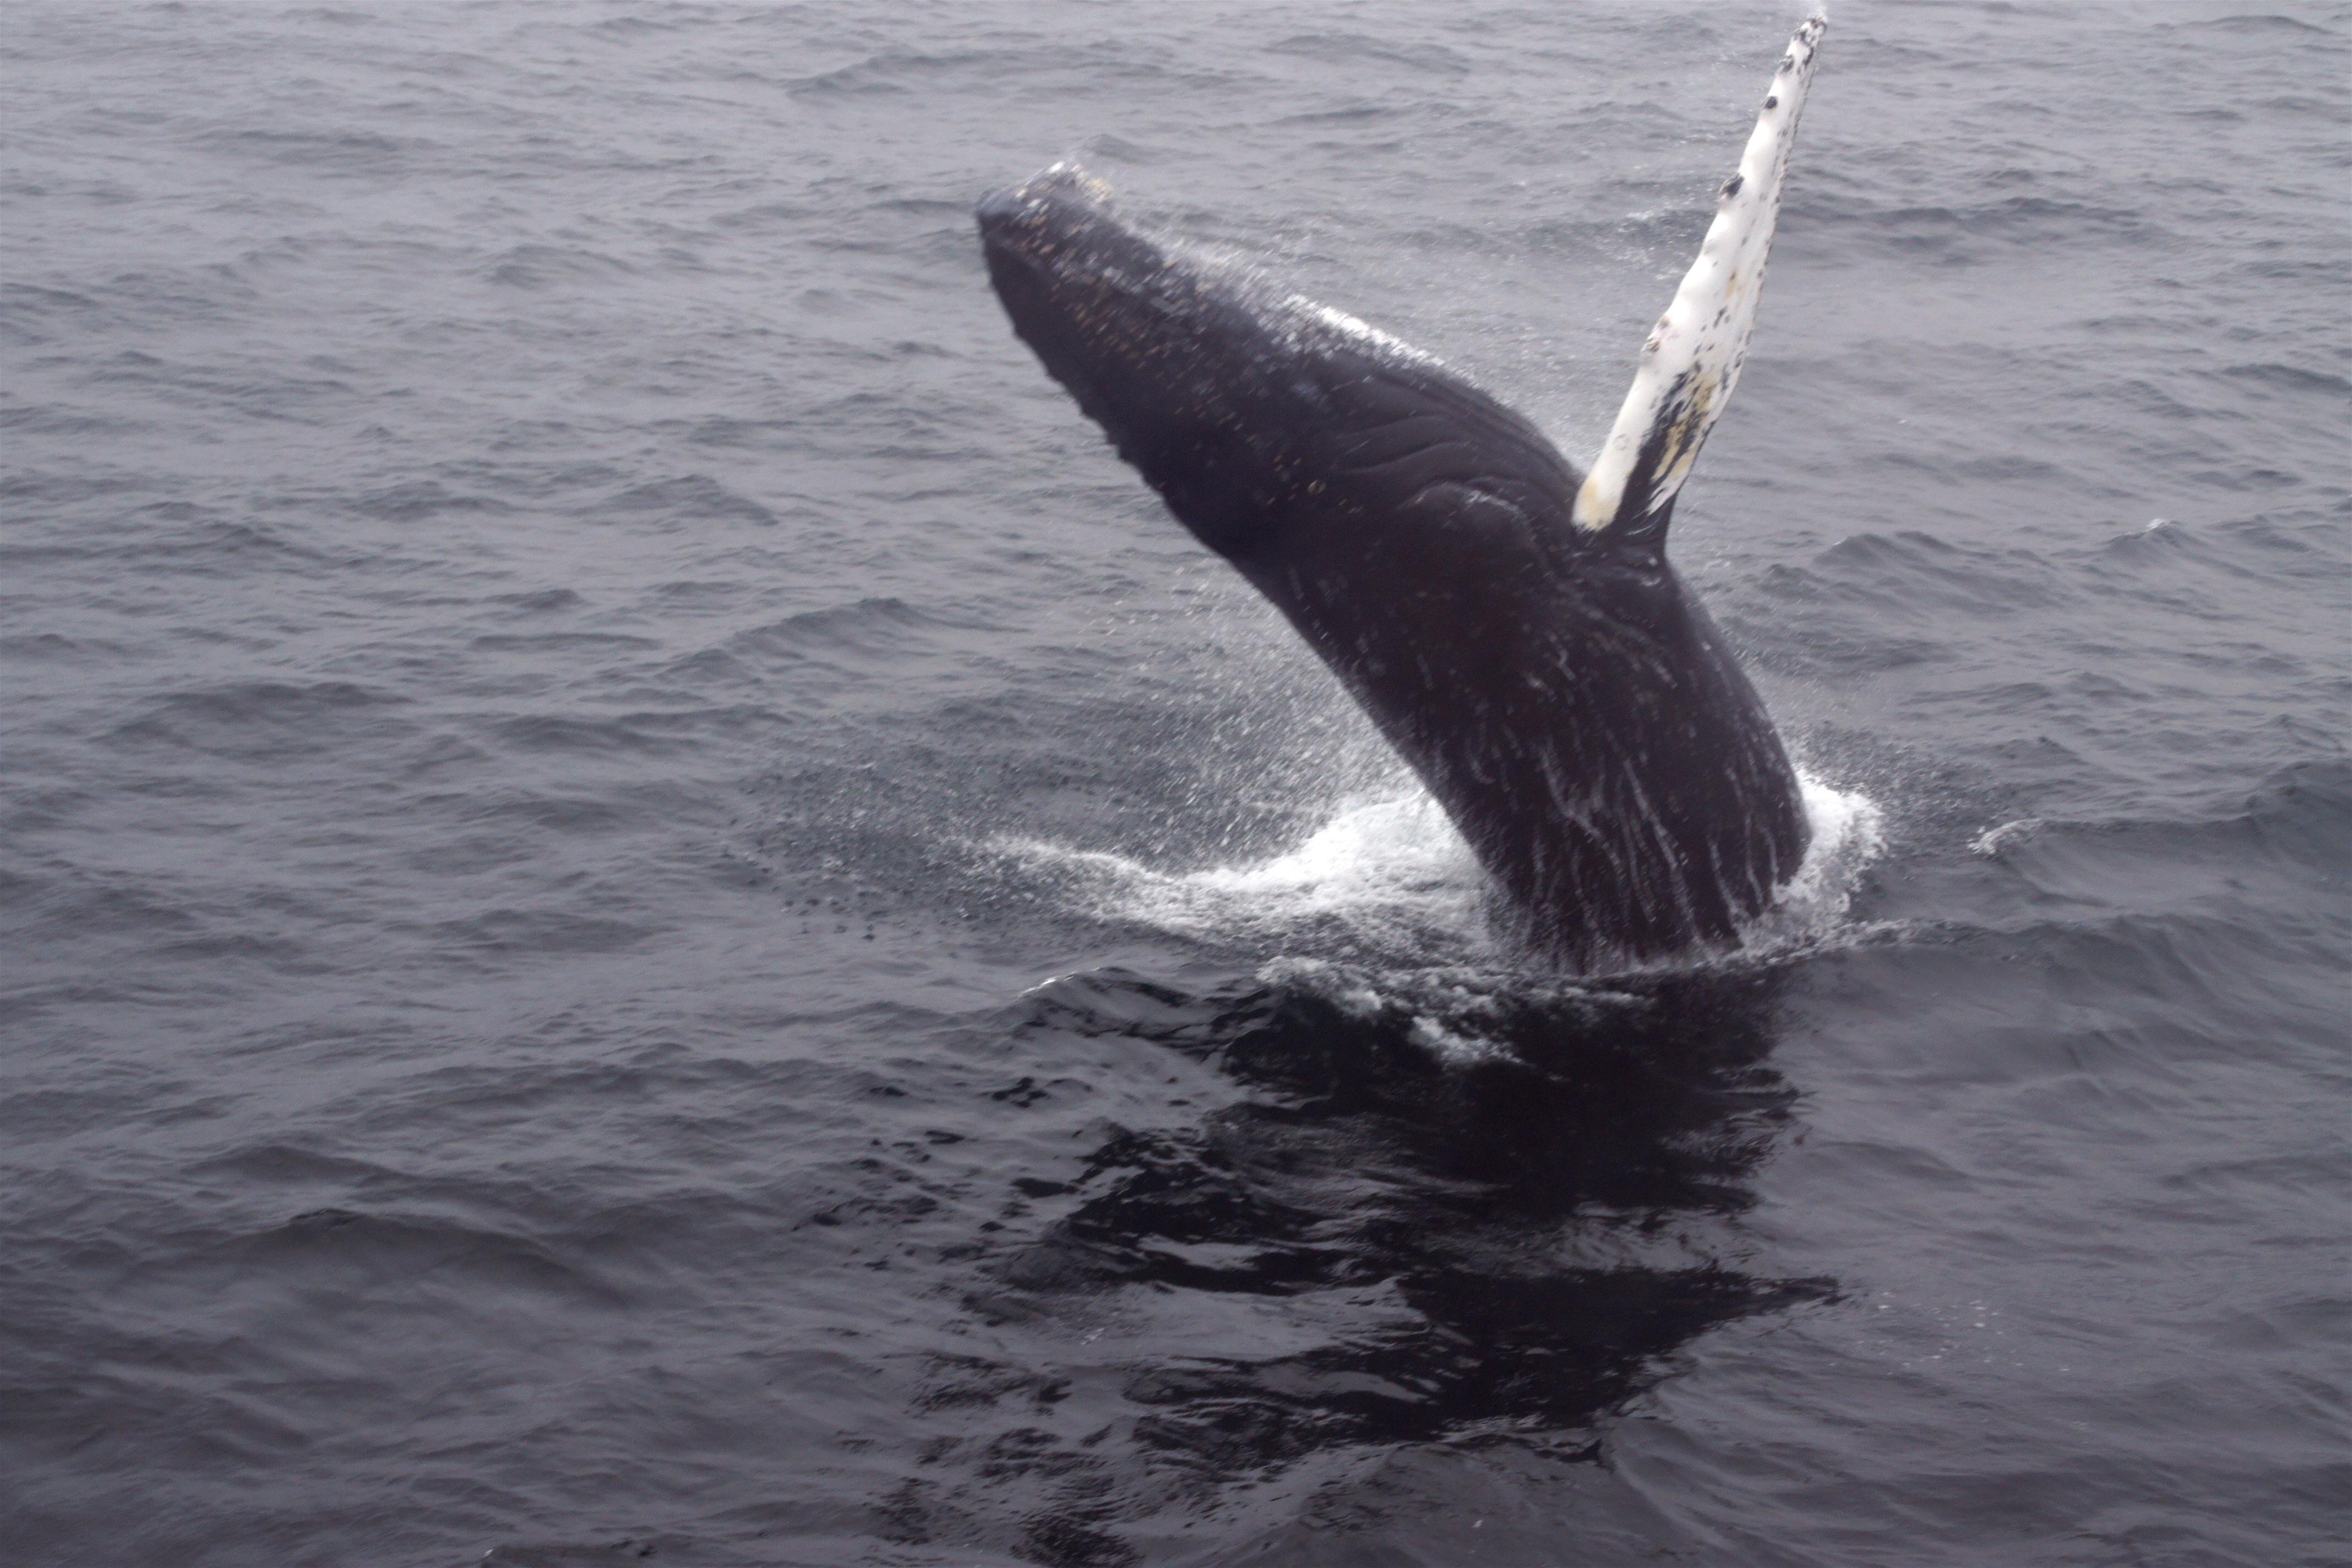 Moby dick marine massachusetts